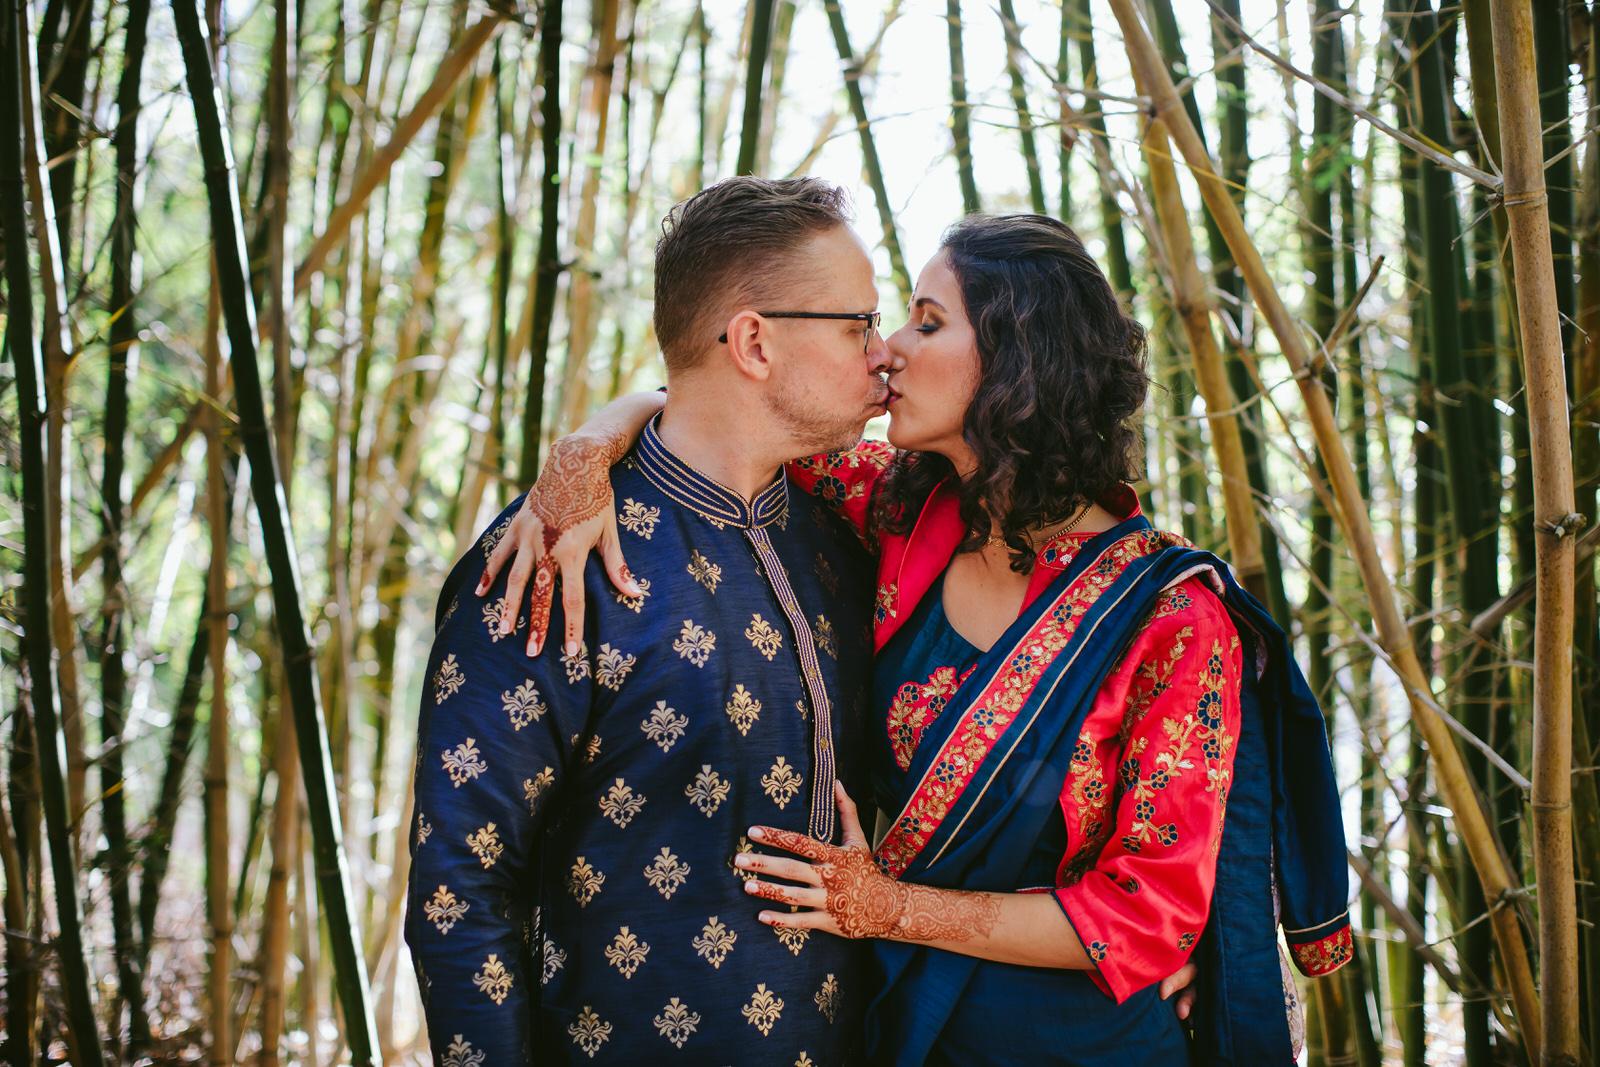 couple-indian-celebration-kashi-wedding-saturday-night-saris.jpg